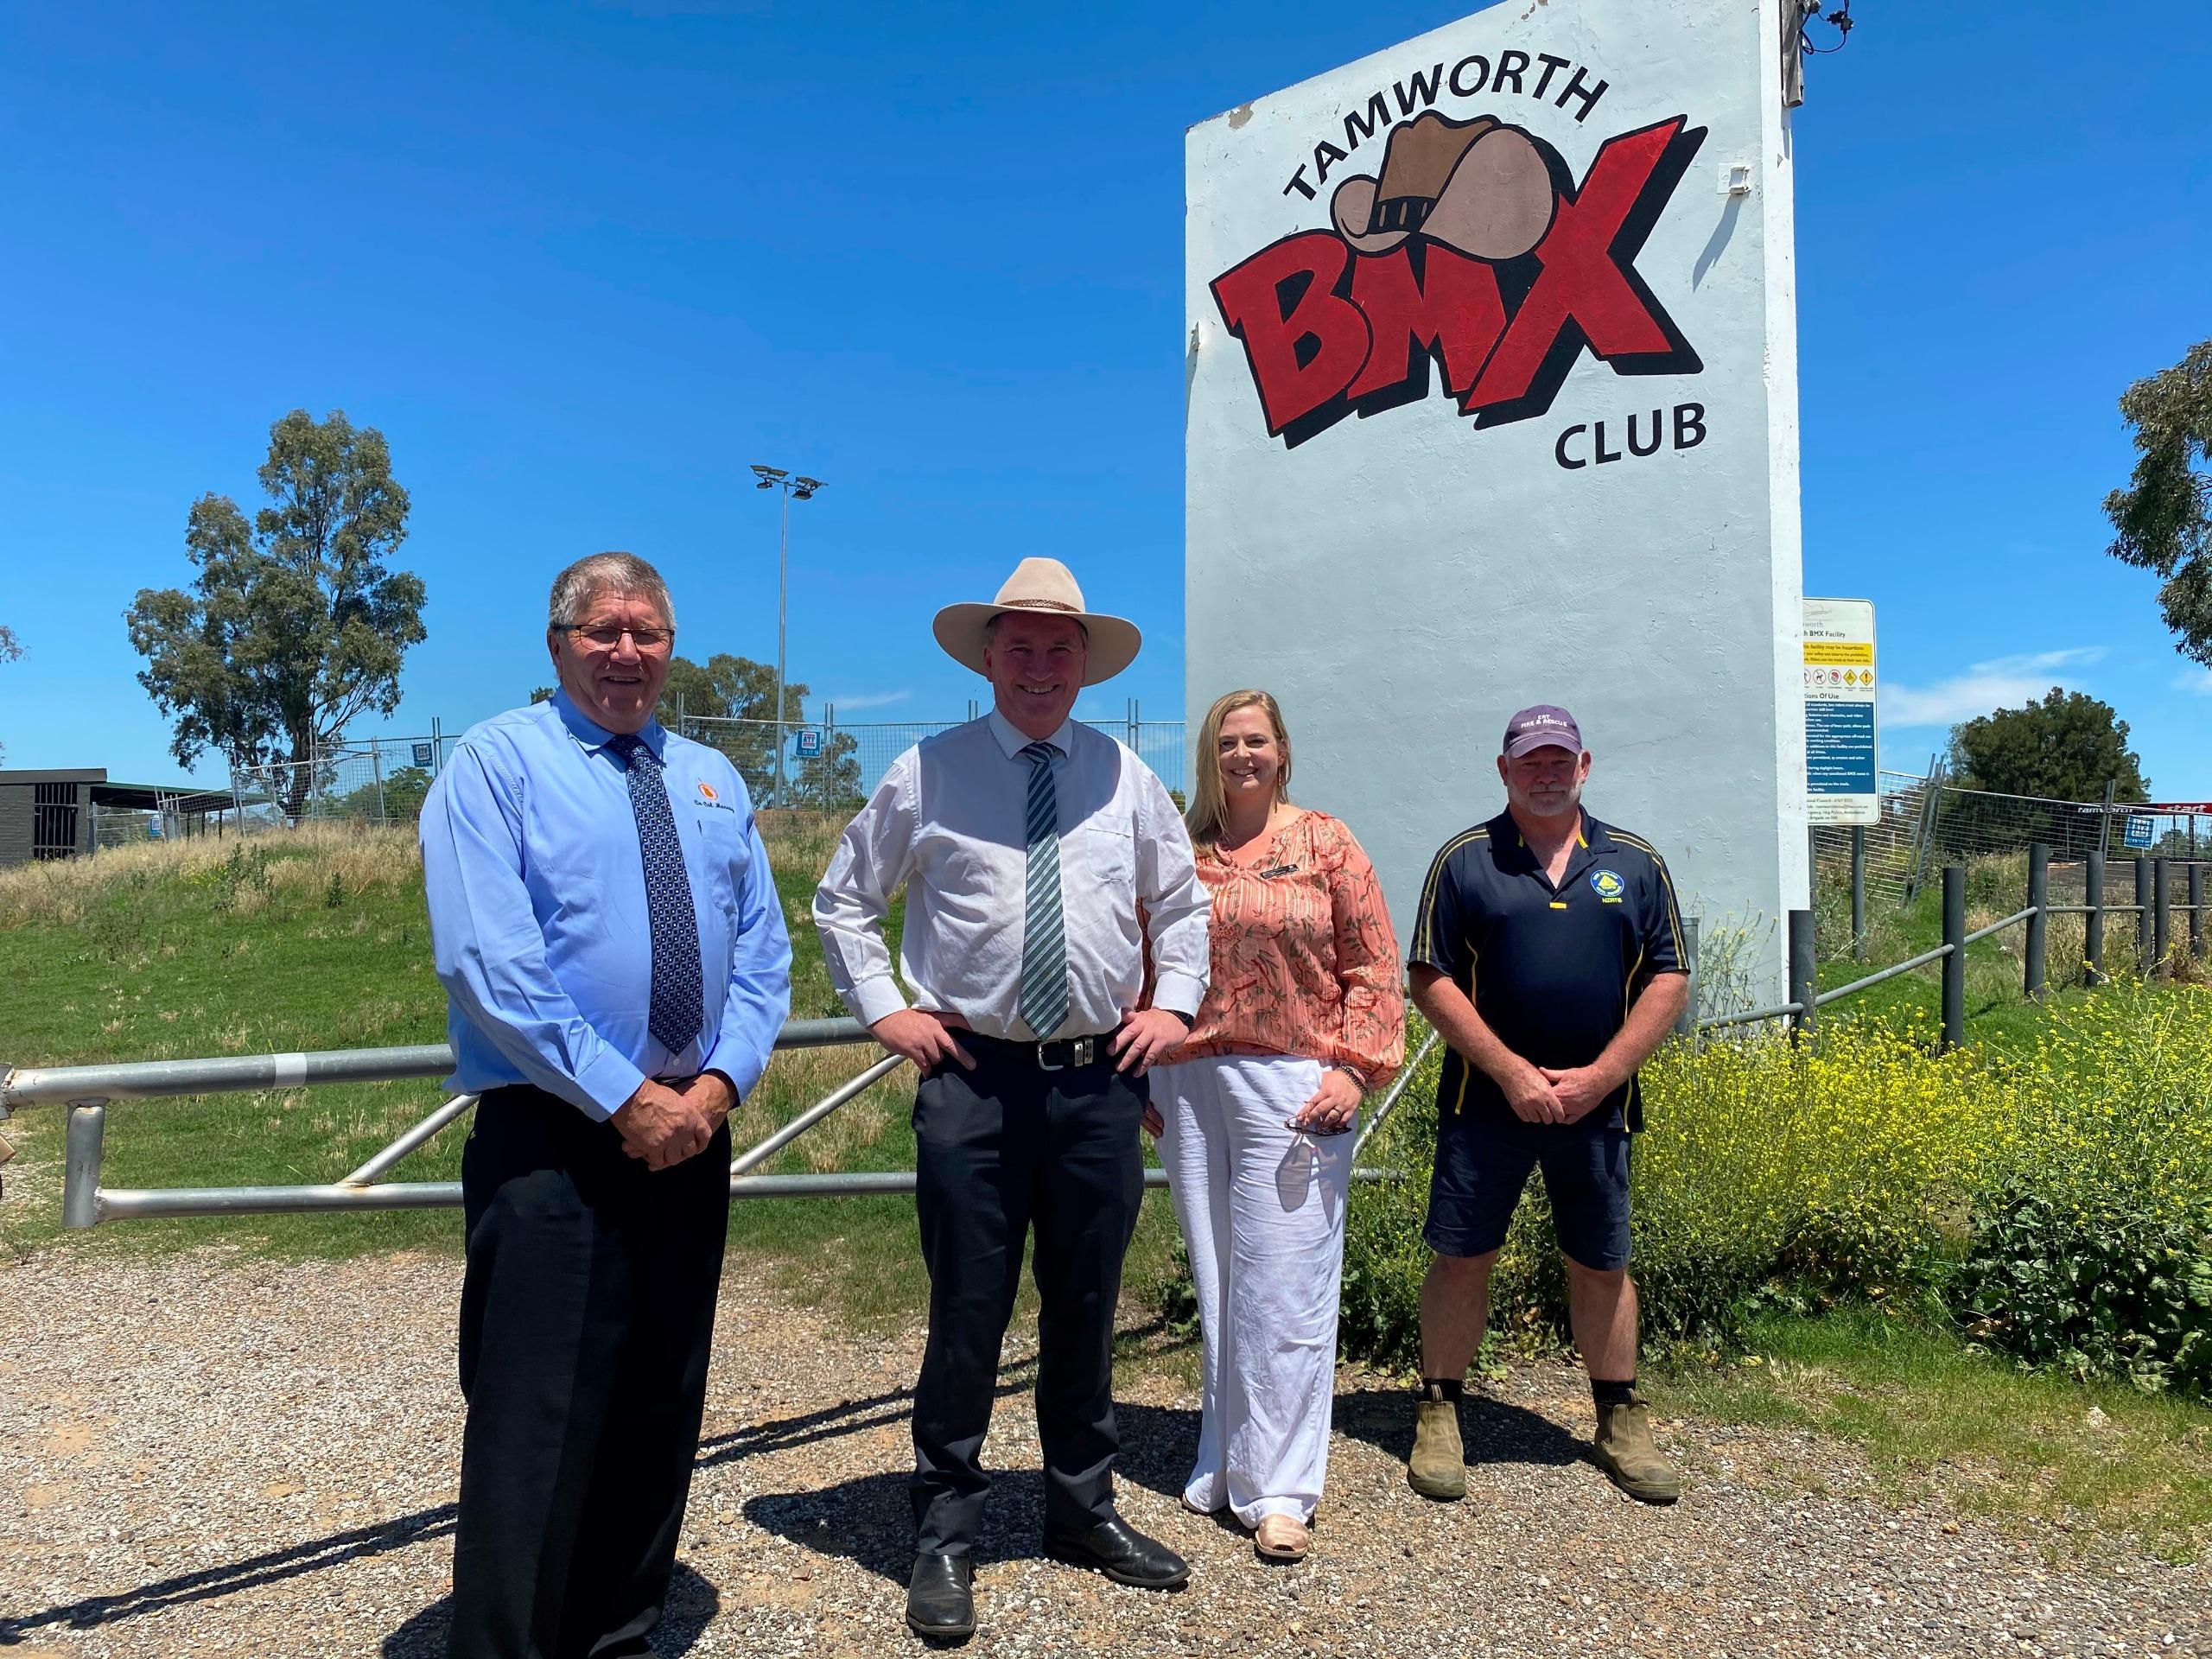 Tamworth Region Mayor Col Murray, Federal Member for New England Barnaby Joyce, Tamworth BMX Club Secretary Emma Cooper and Brett Morris